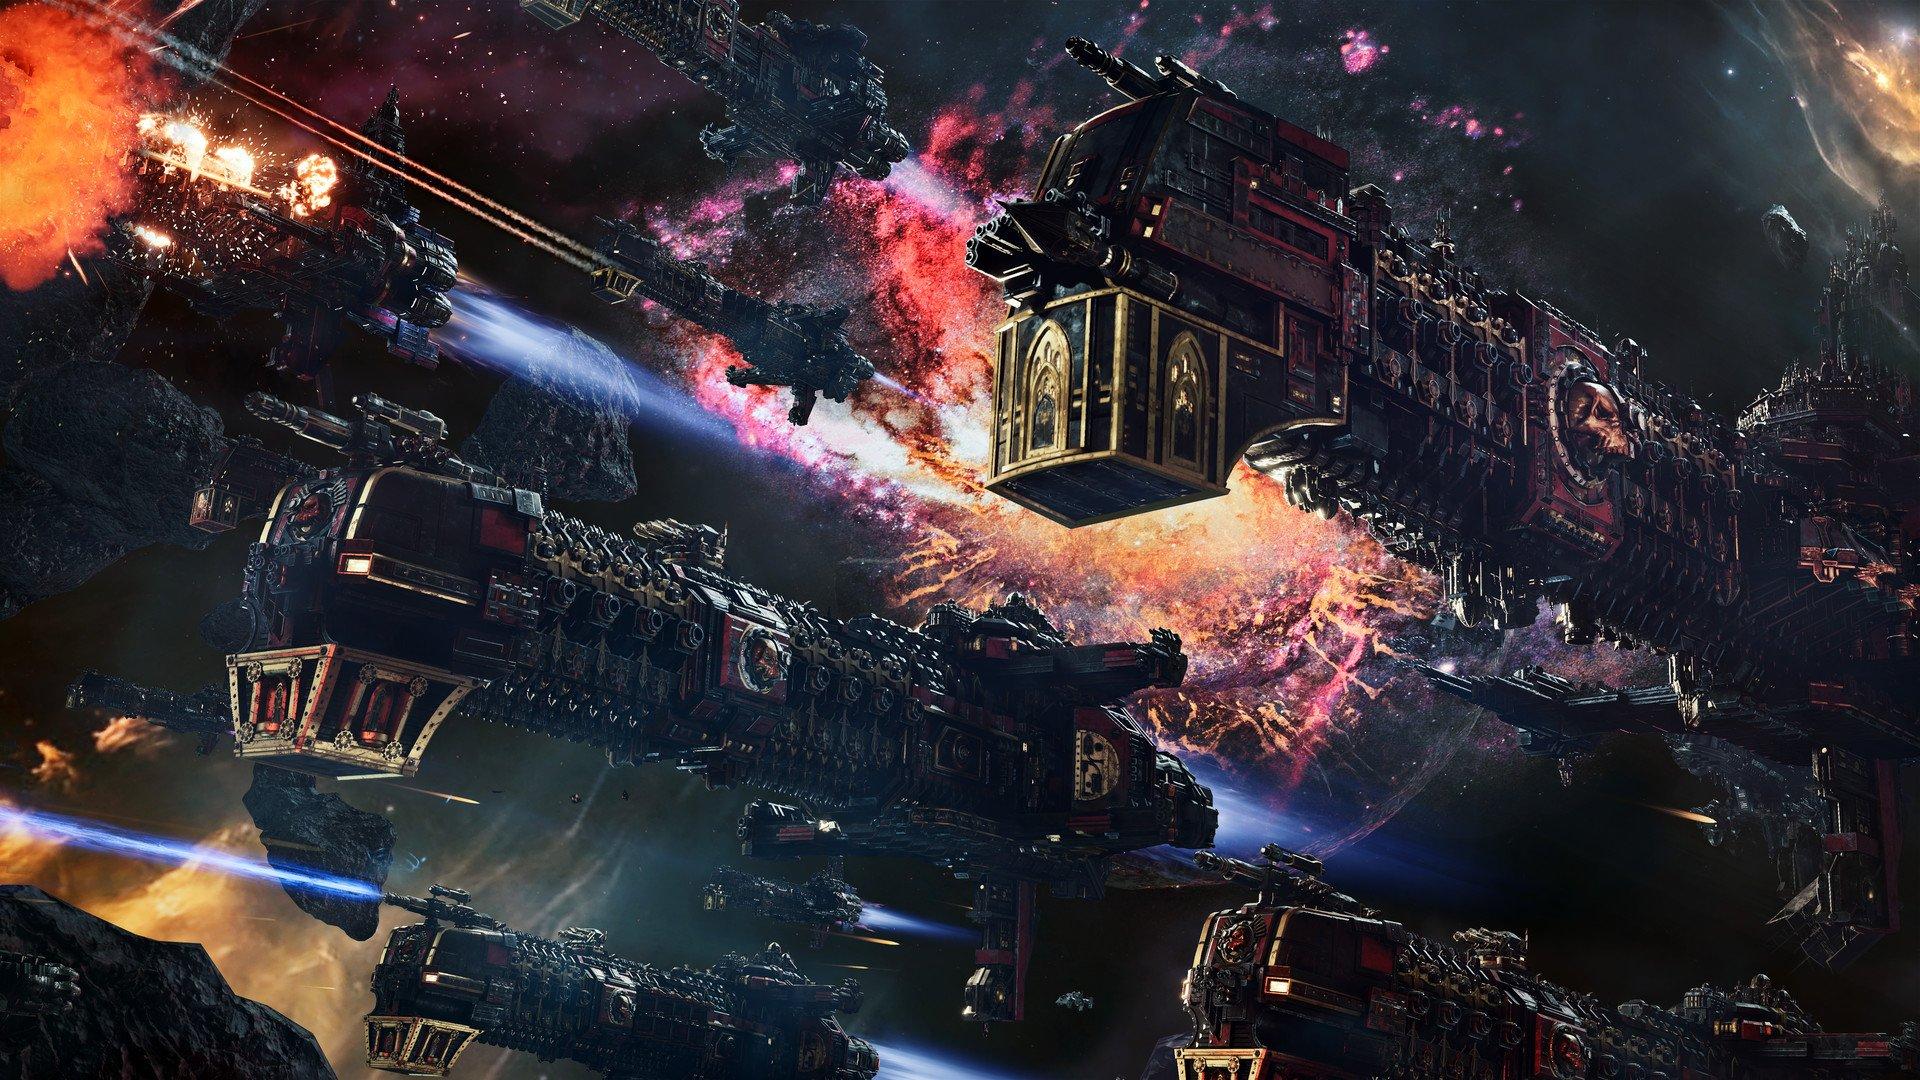 battlefleet-gothic-armada-2-se-retrasa-hasta-2019-frikigamers.com